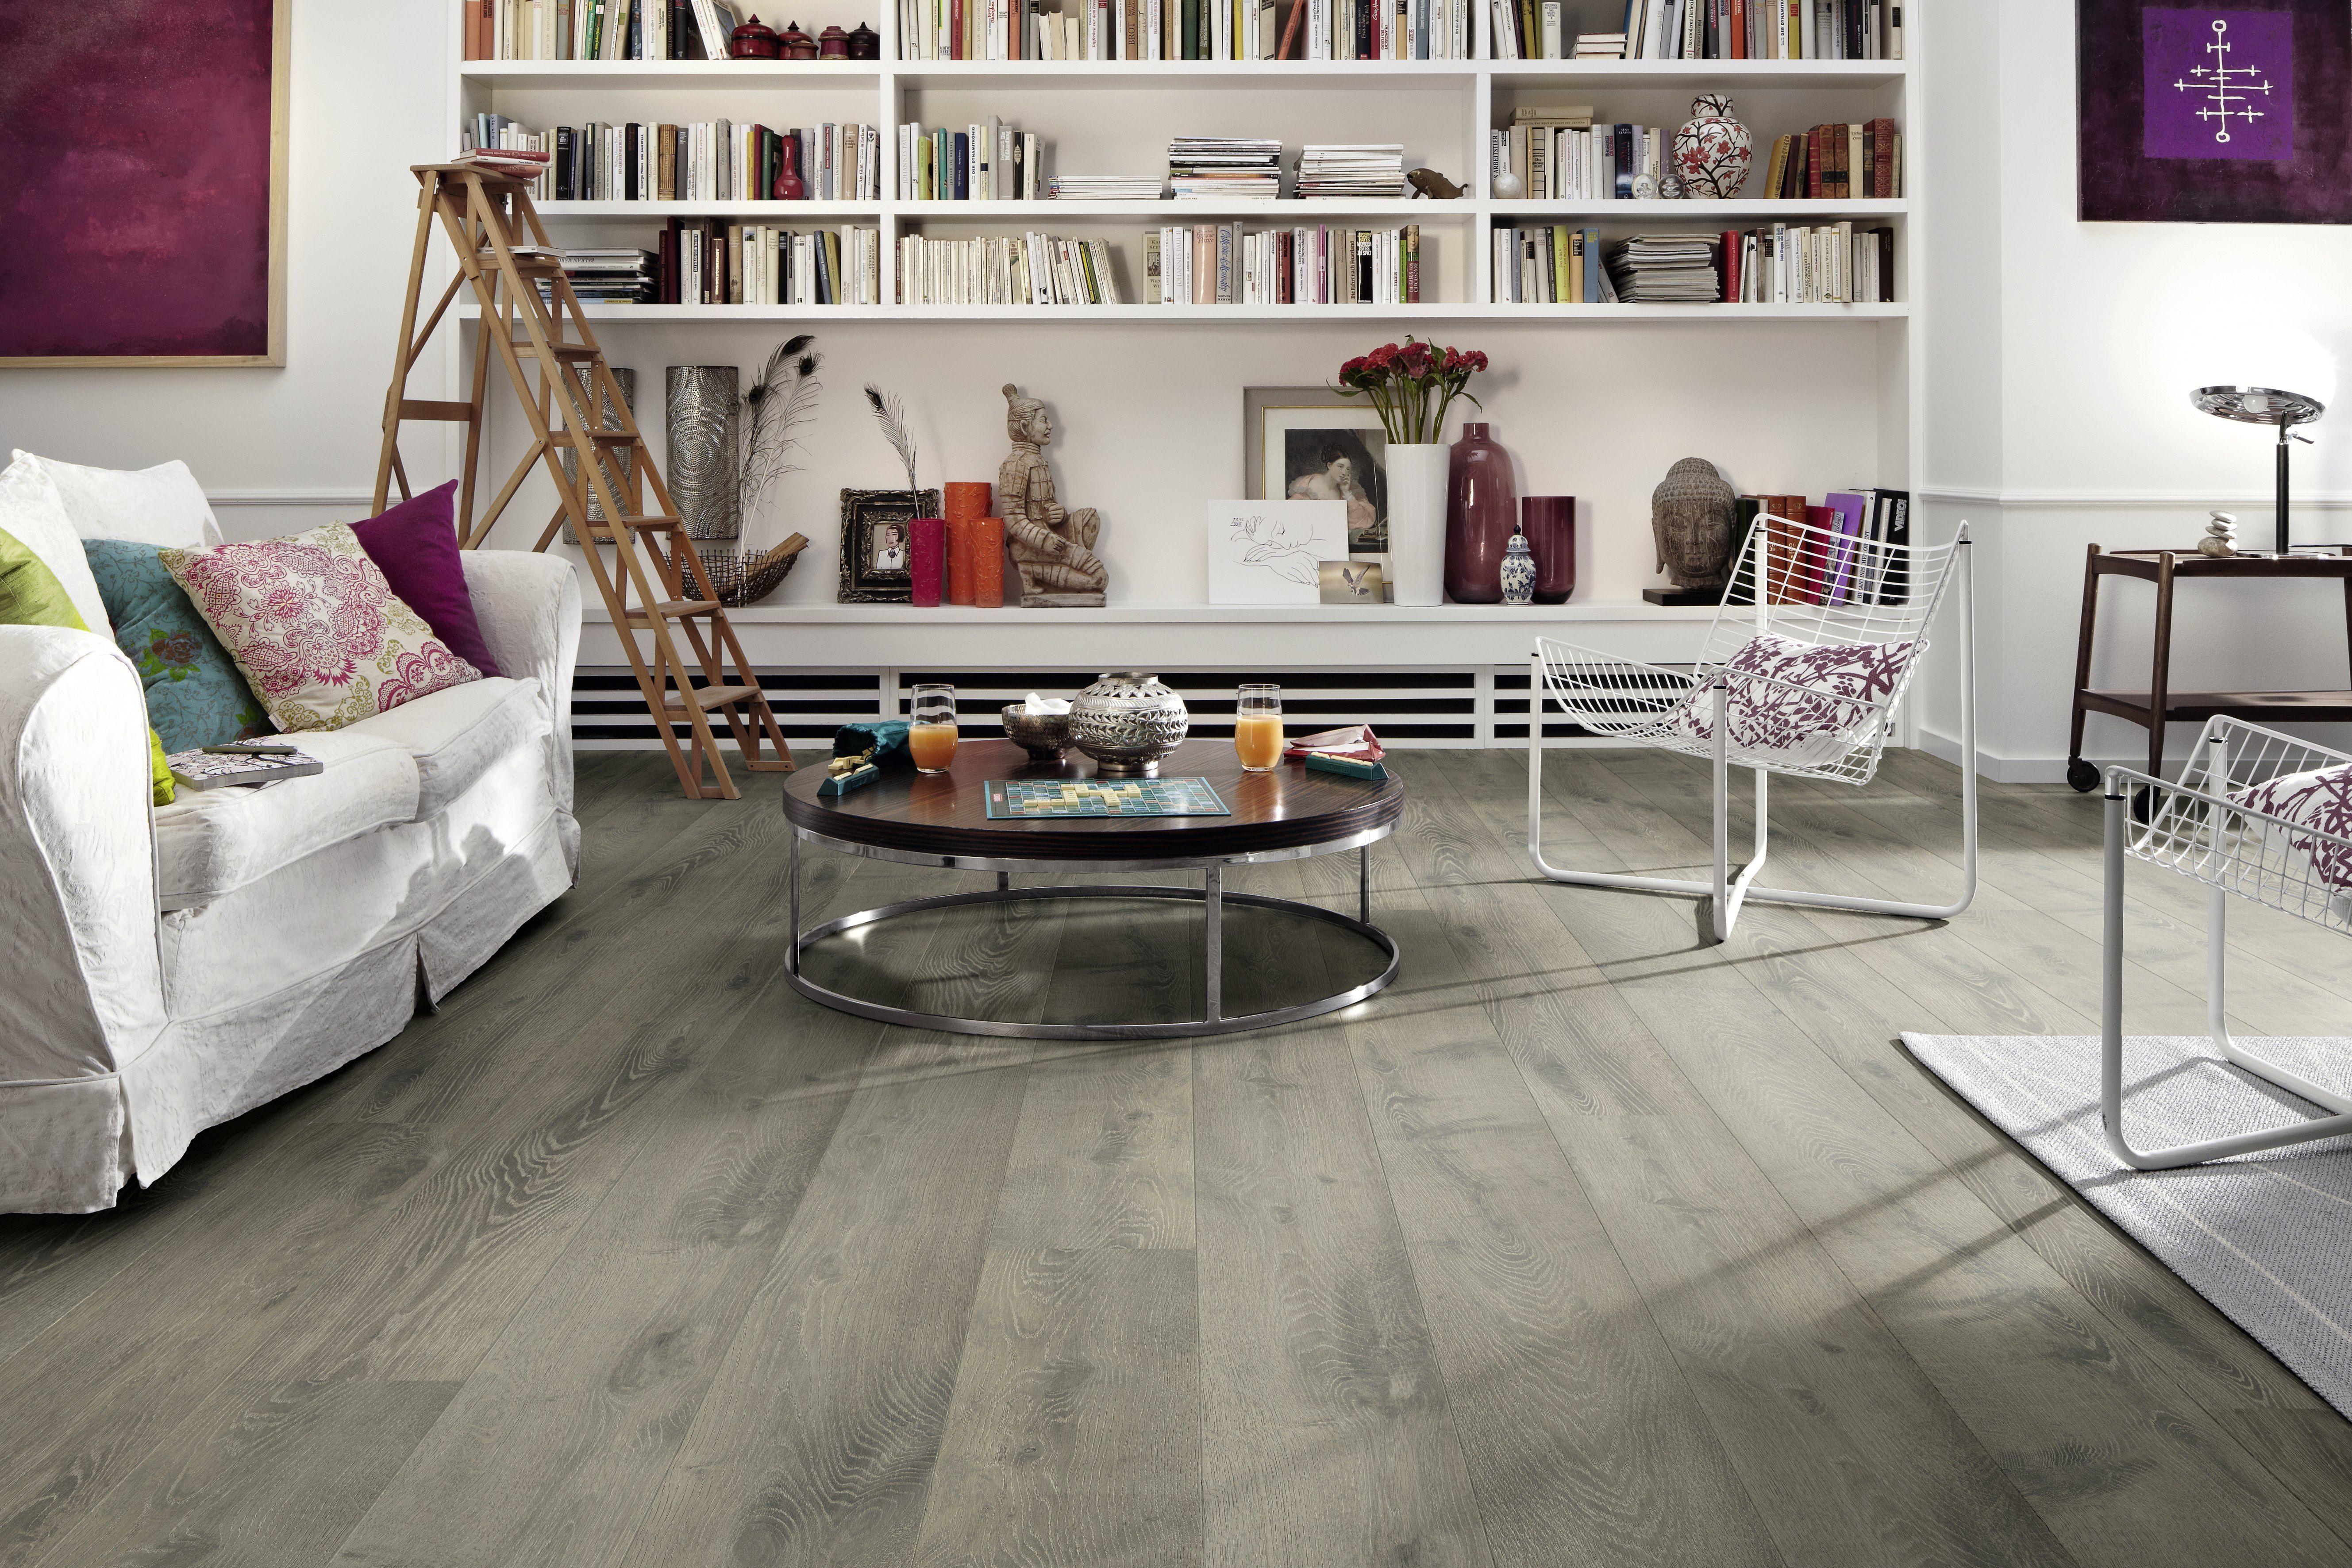 Grijs Laminaat Woonkamer : Laminaat woonkamer laminaat grijs vloeren laminaat grijs